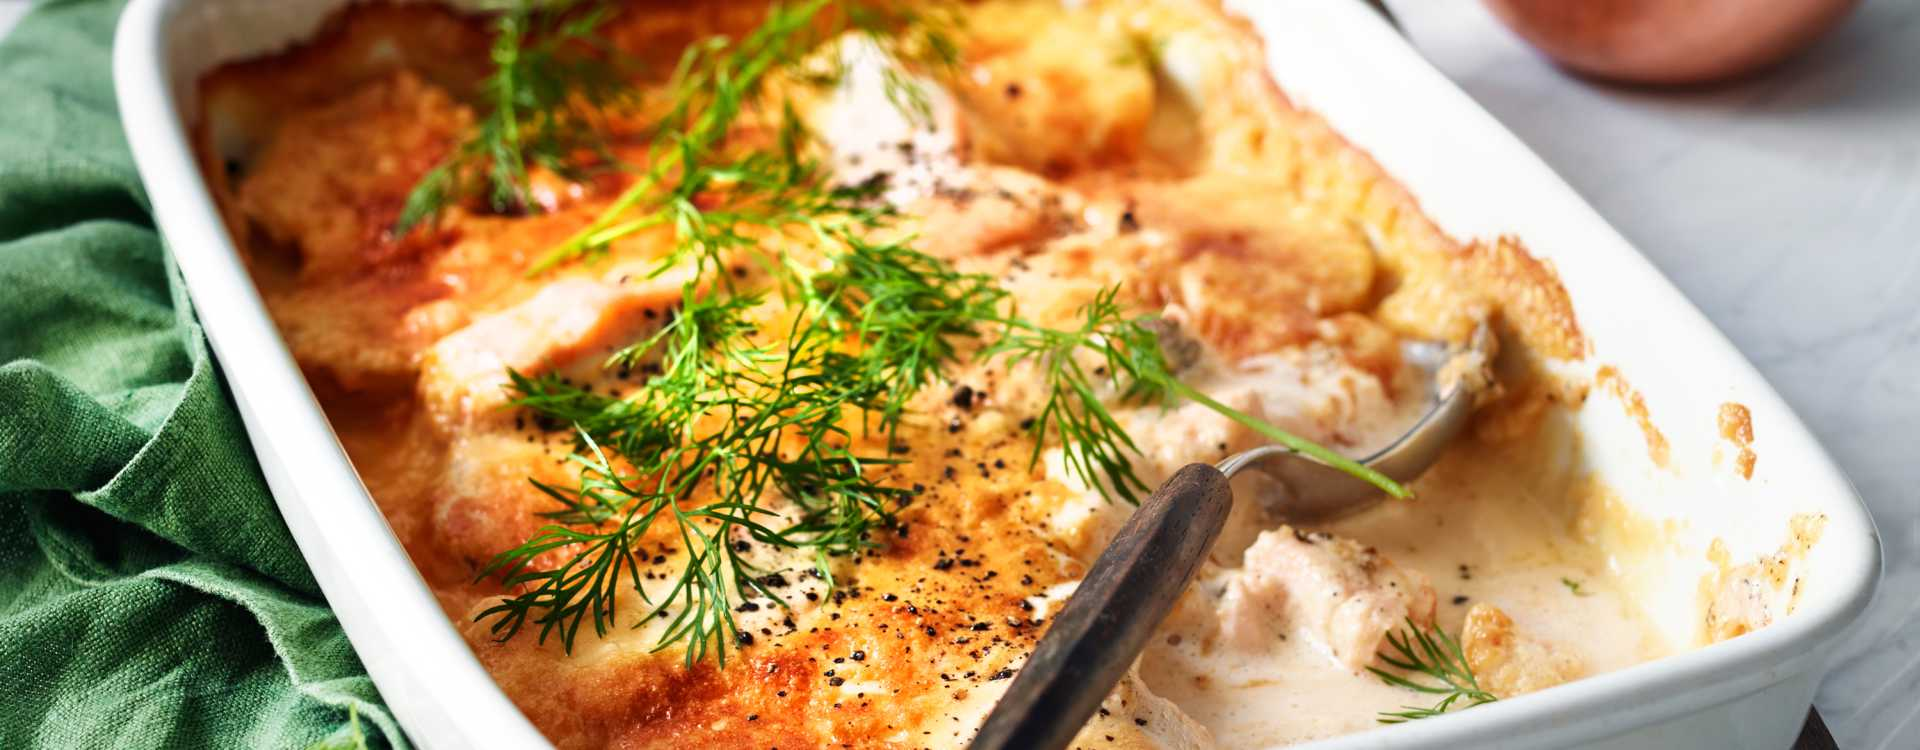 Laksegrateng med dill, poteter og kaviarfløte